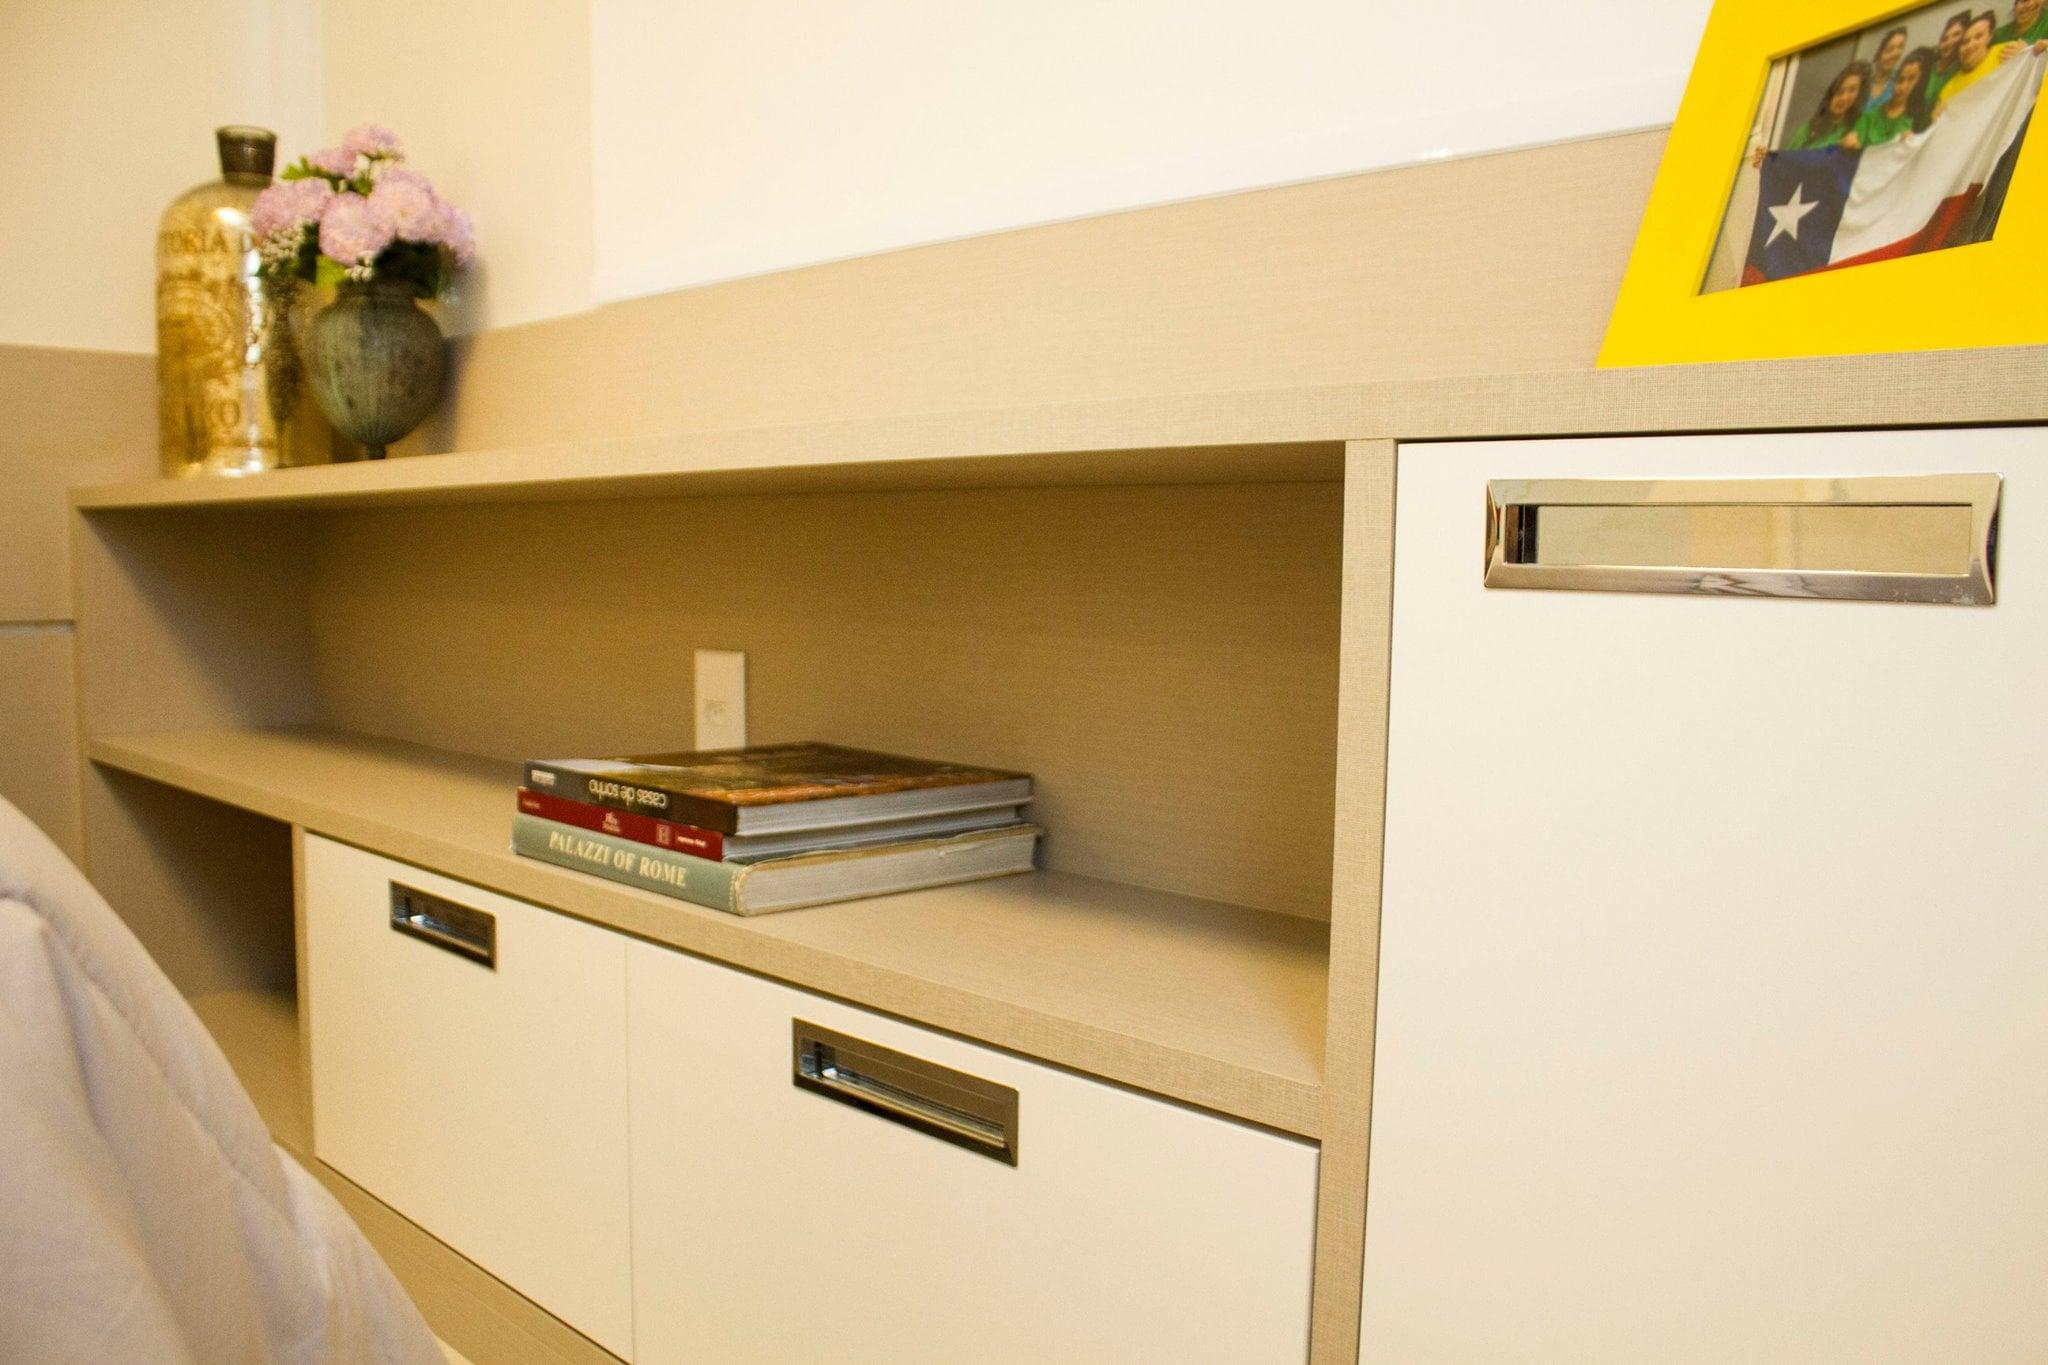 12-Apartamento no Recreio dos Bandeirantes - Arquiteta Carla Del Grande